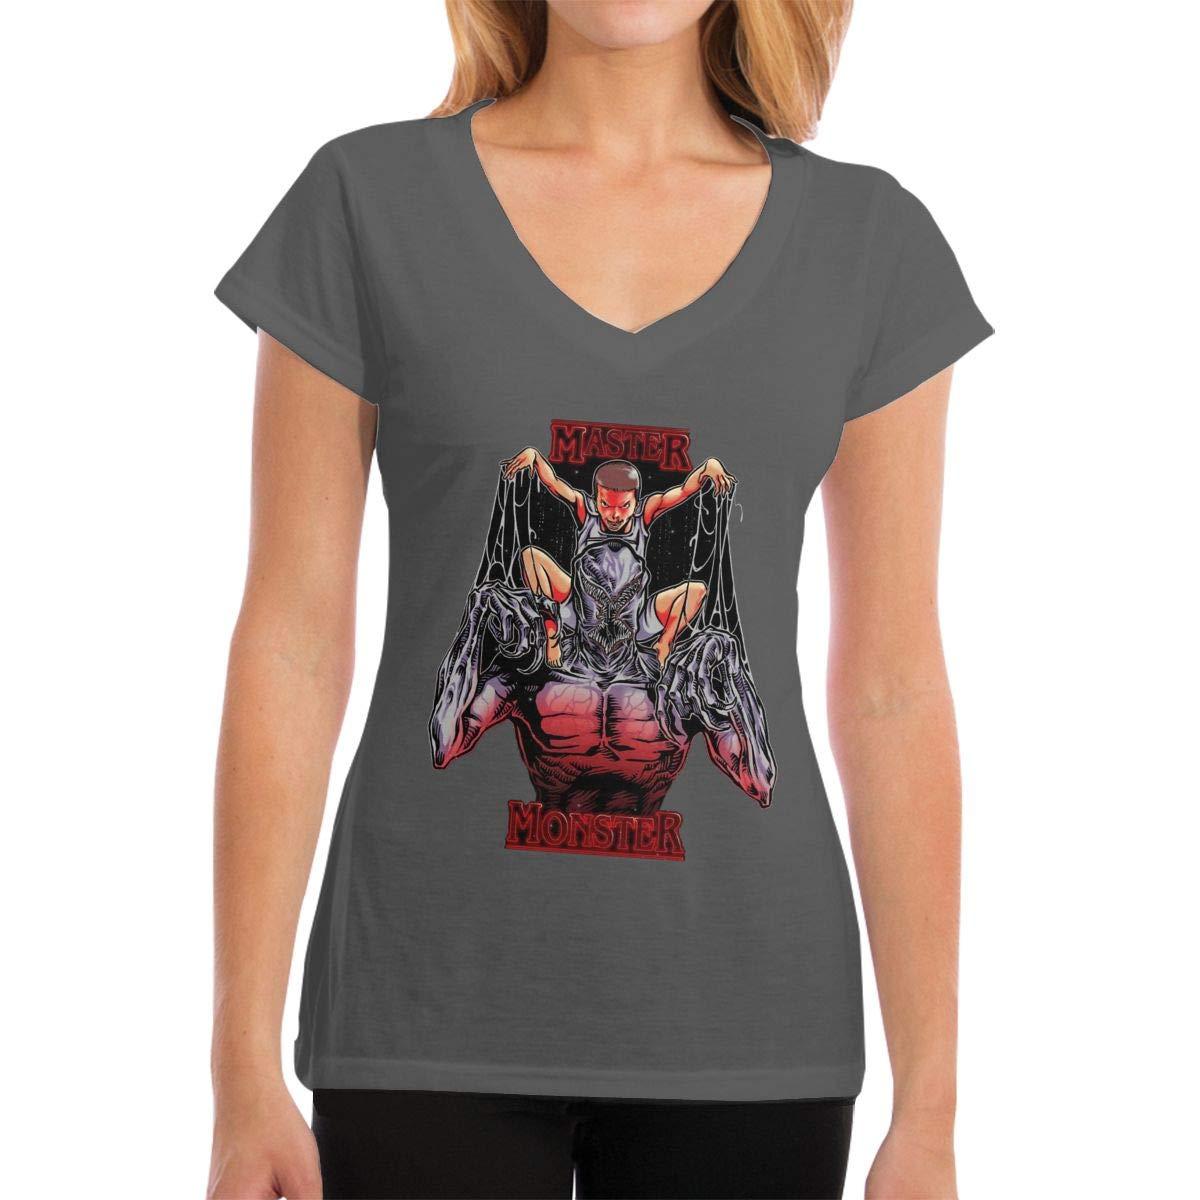 Newsmarter Stranger Things Female Cute Fashion T Shirt